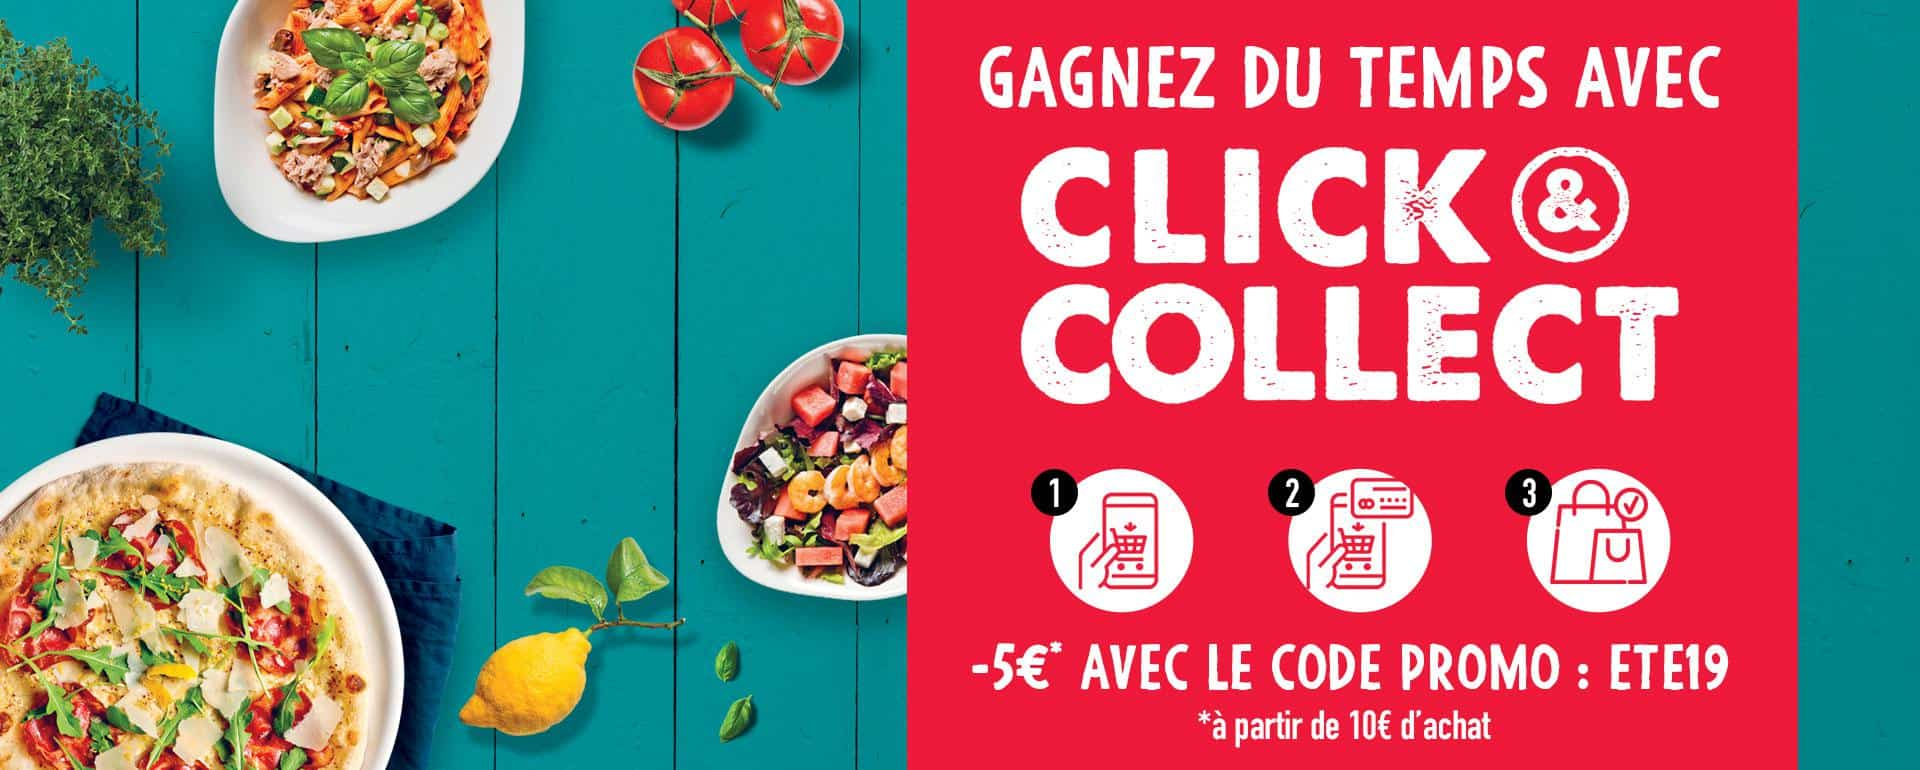 restaurant italien à emporter avec click and collect